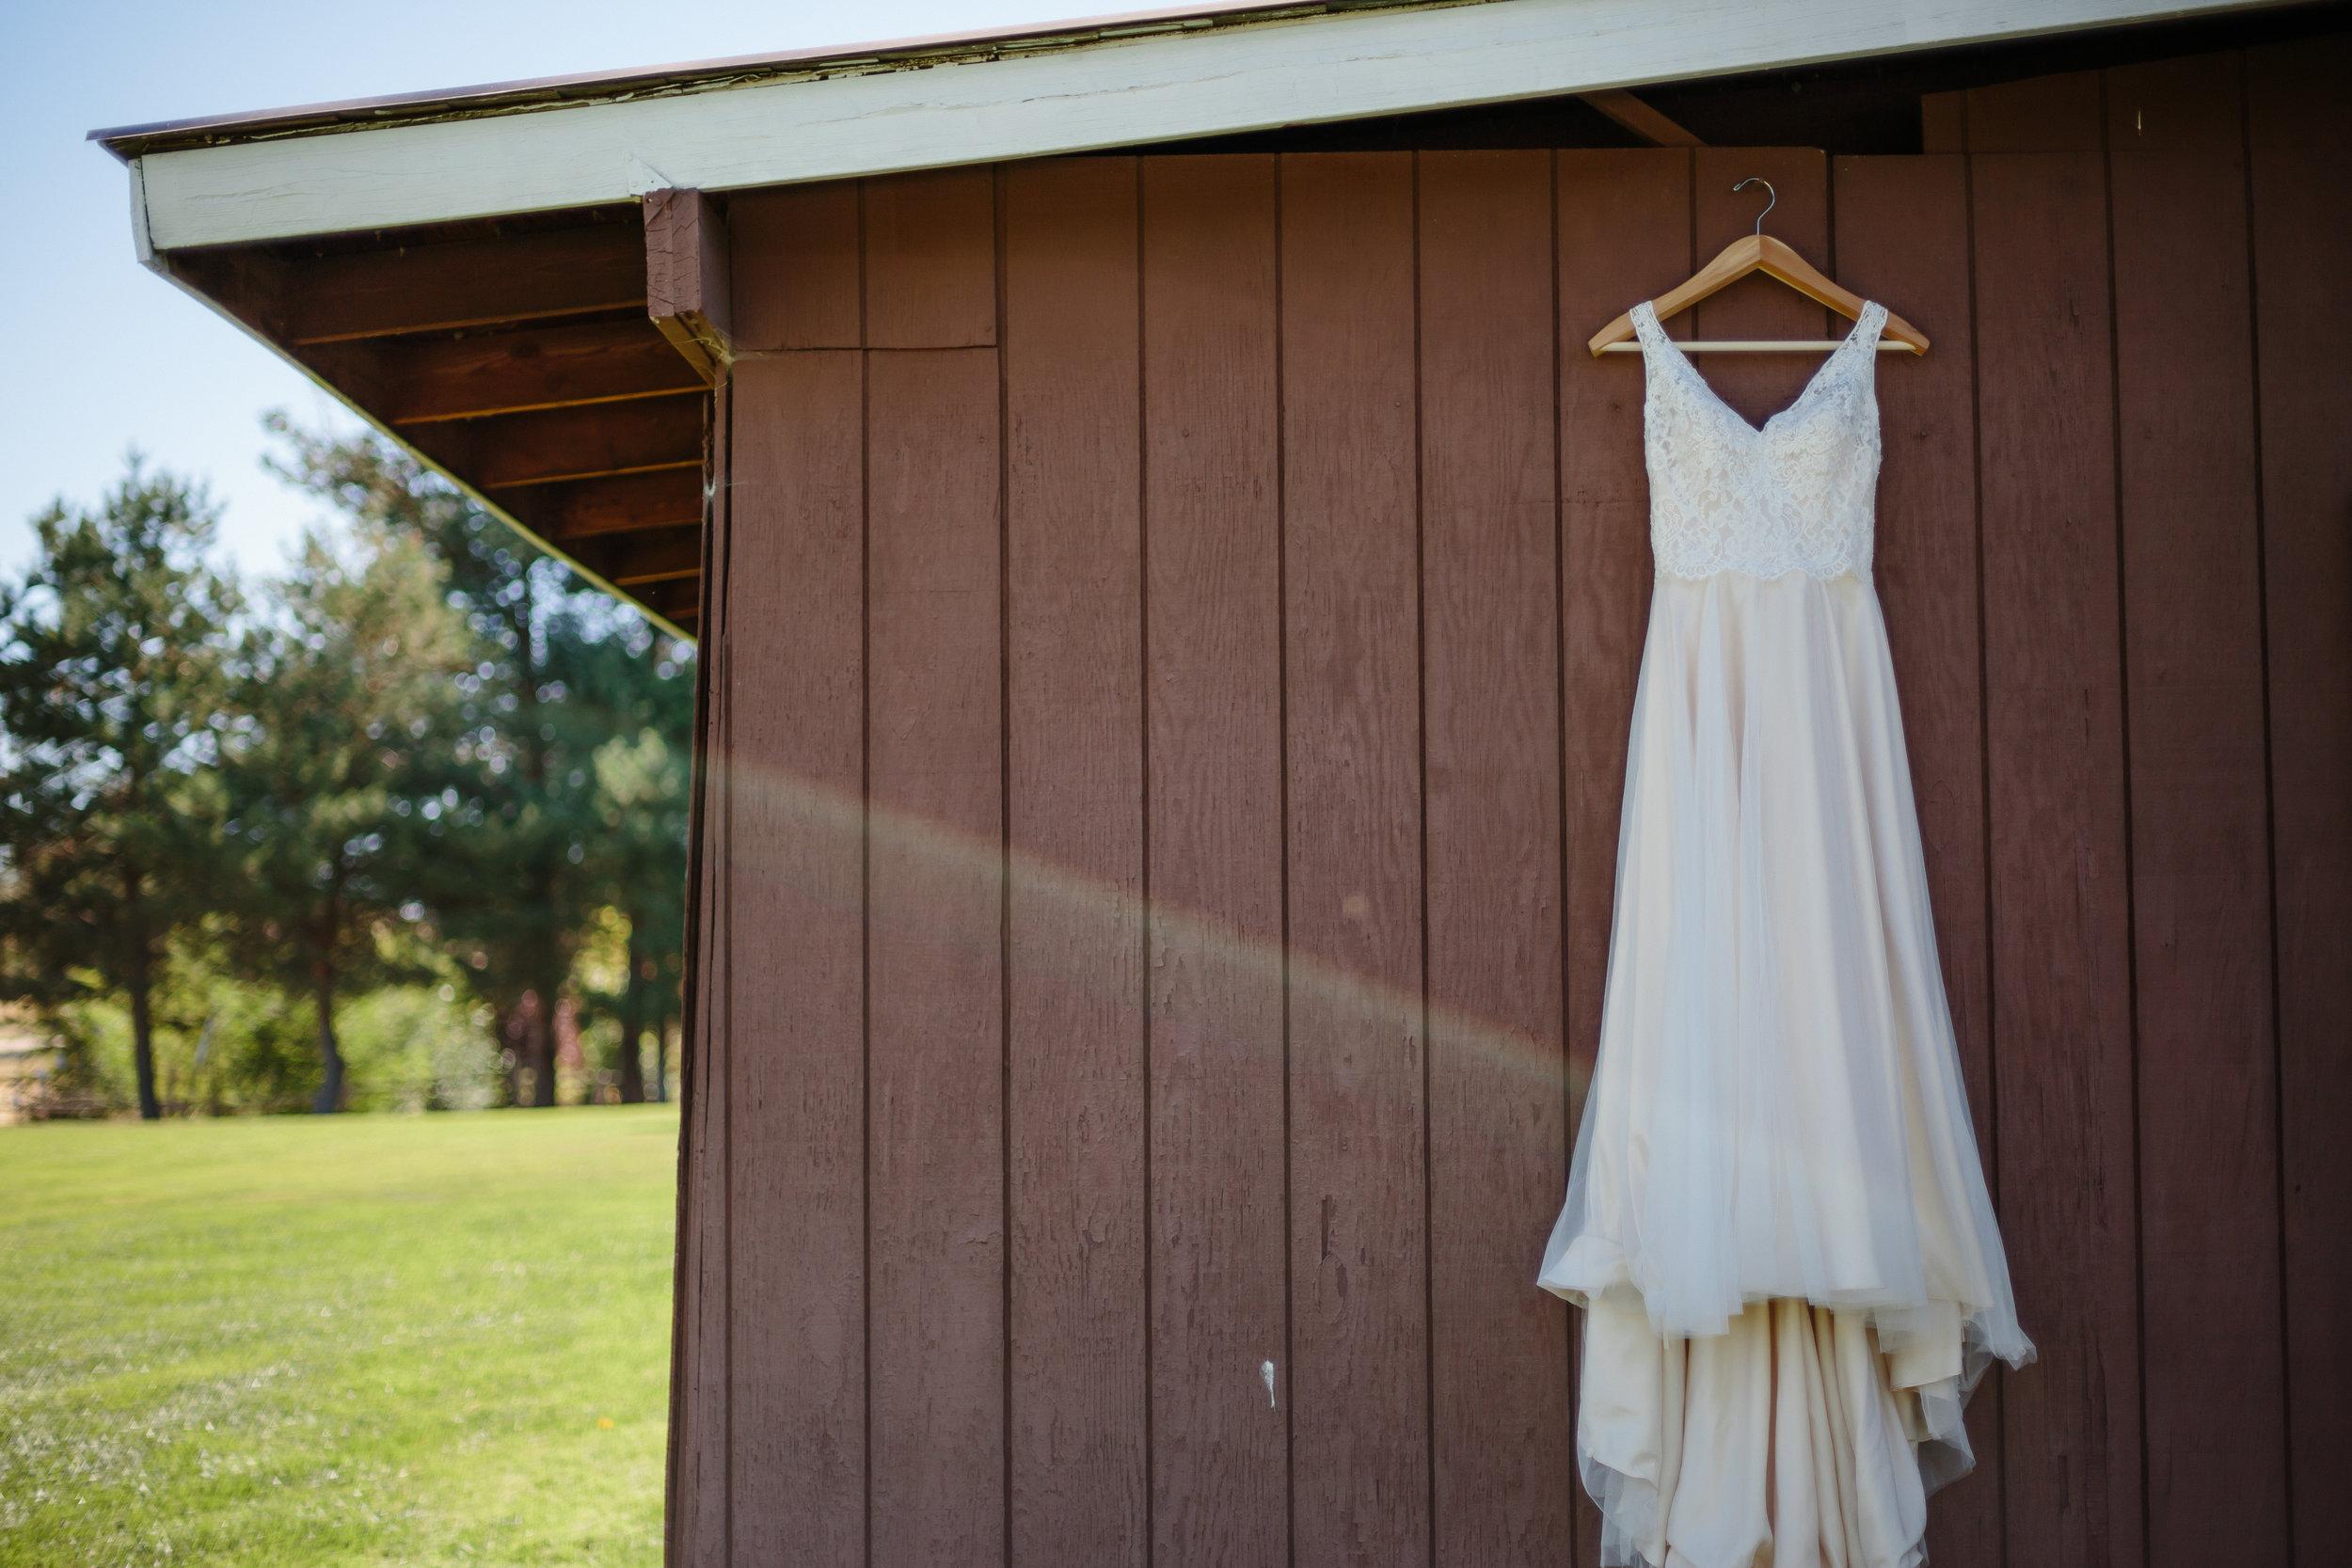 Jordan & Shantel Married - Idaho - Corrie Mick Photography-1.jpg